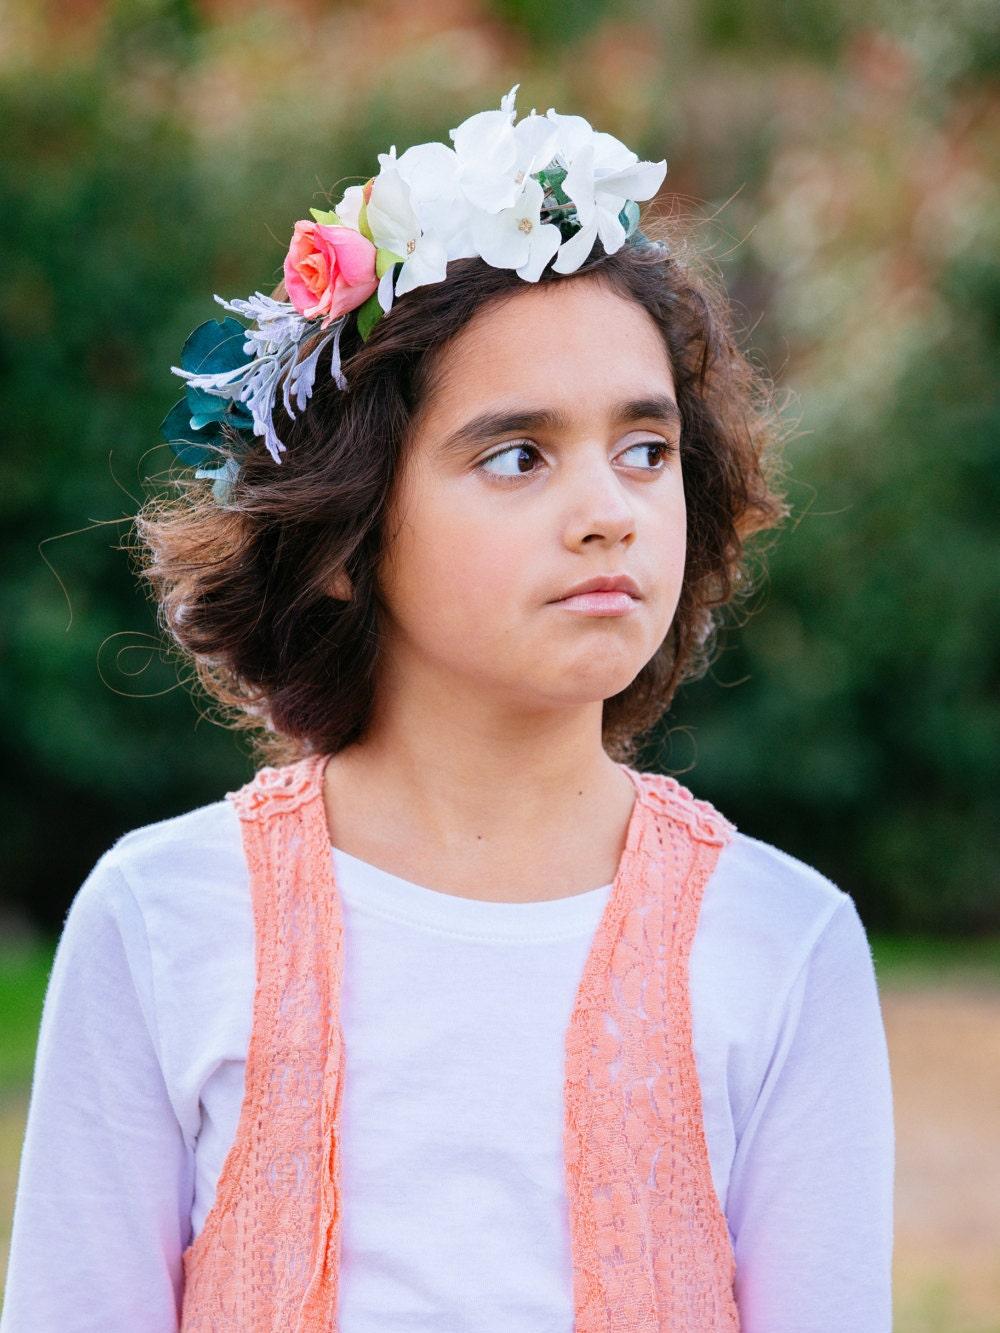 Childrens Flower Crown Flower Crown For Kids Flower Crown Etsy